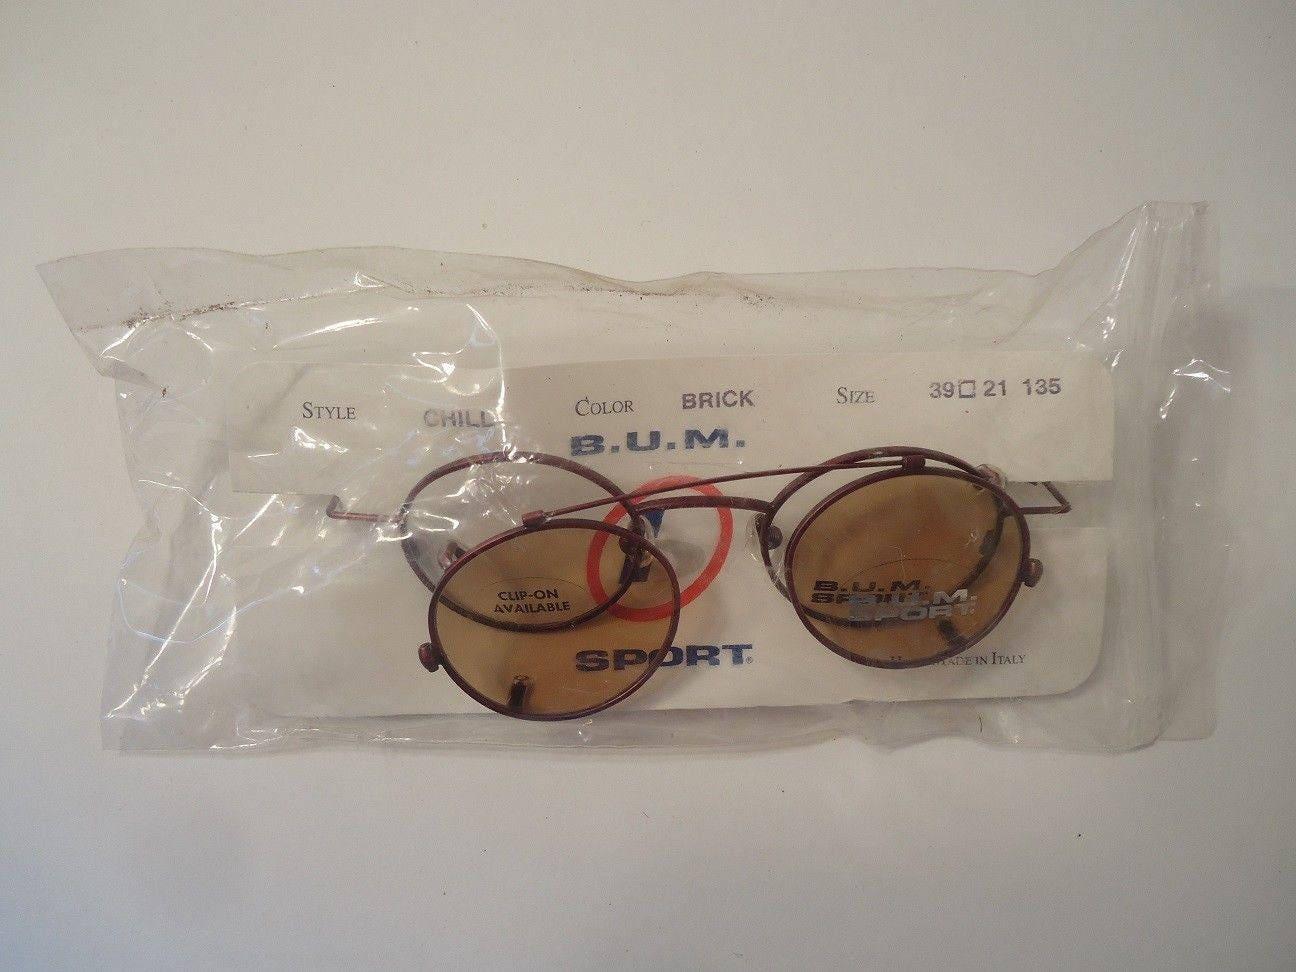 NOS B.U.M. Sport Steampunk Chill Brick Eye Glass Frames